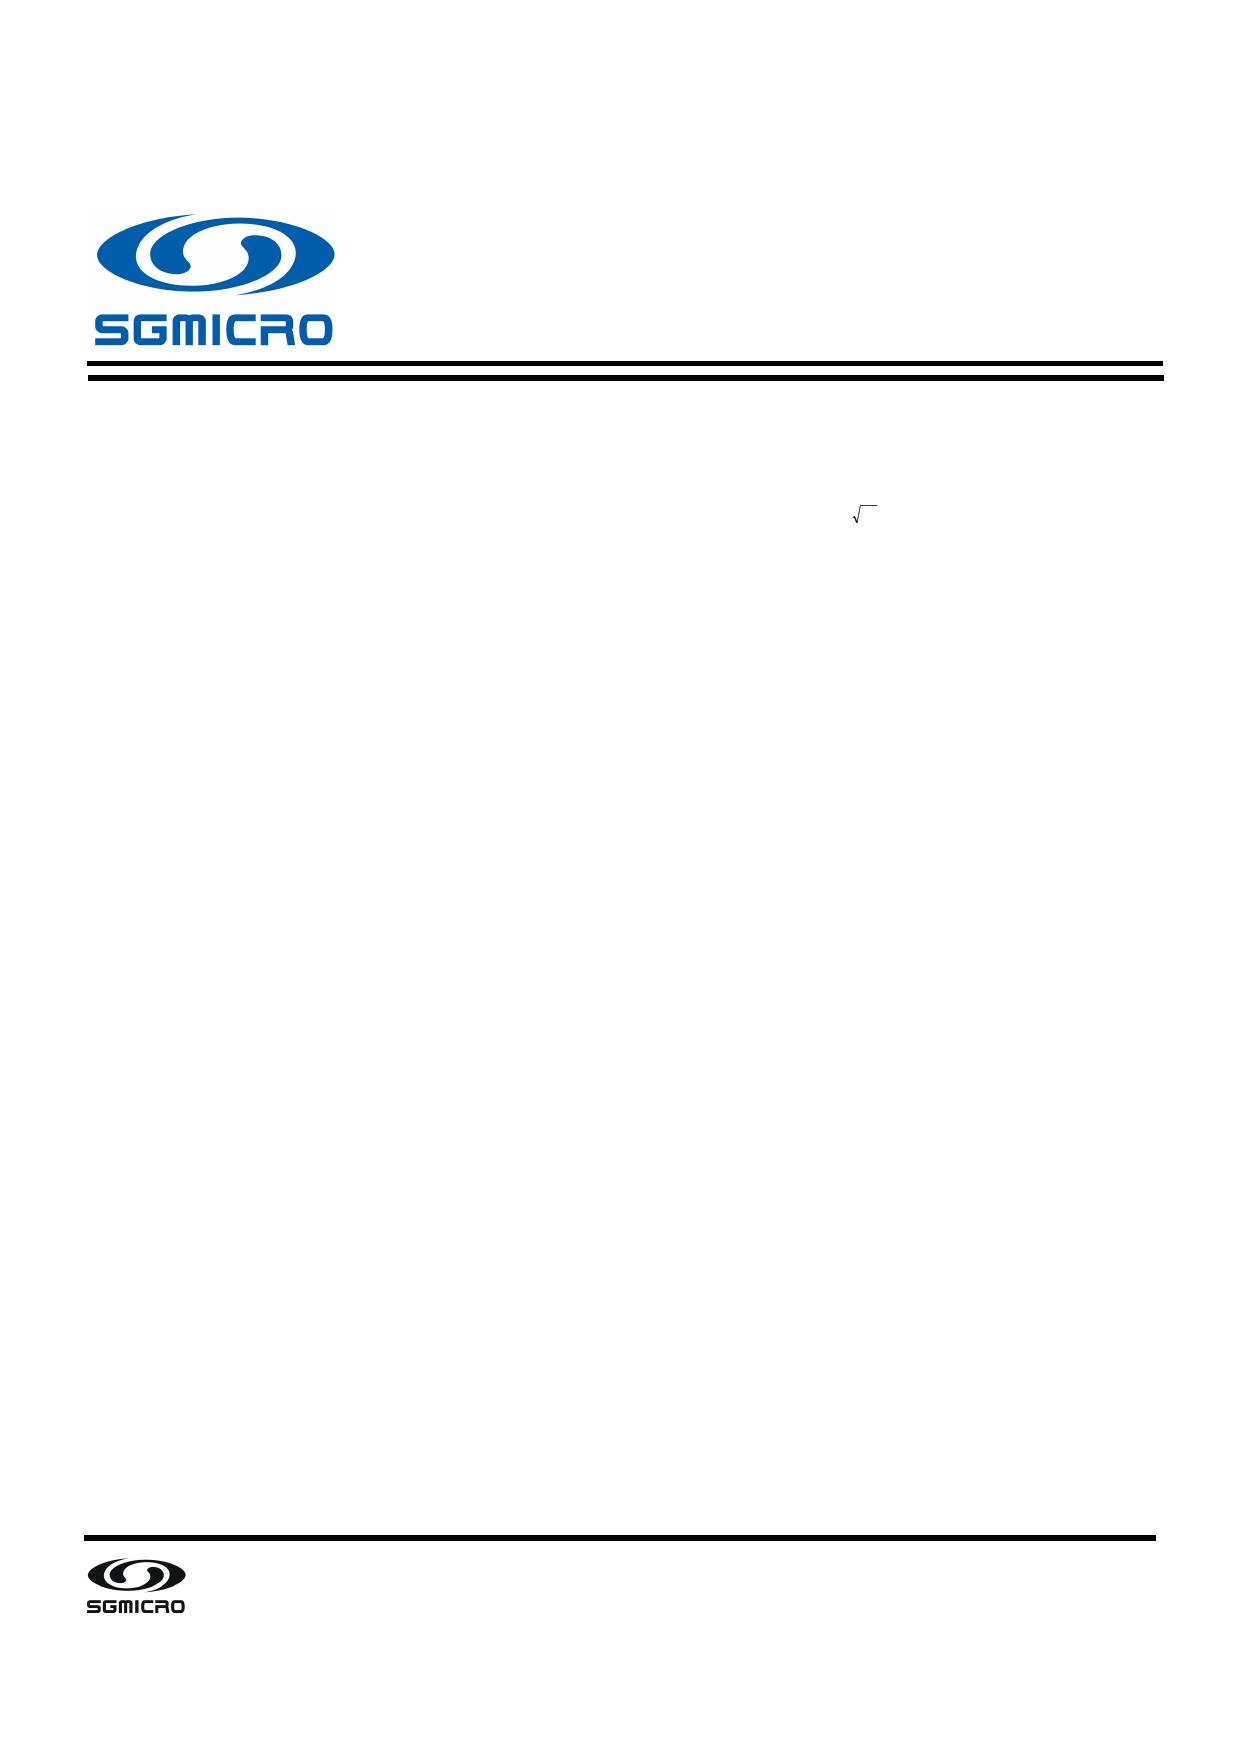 SGM8933 datasheet, circuit